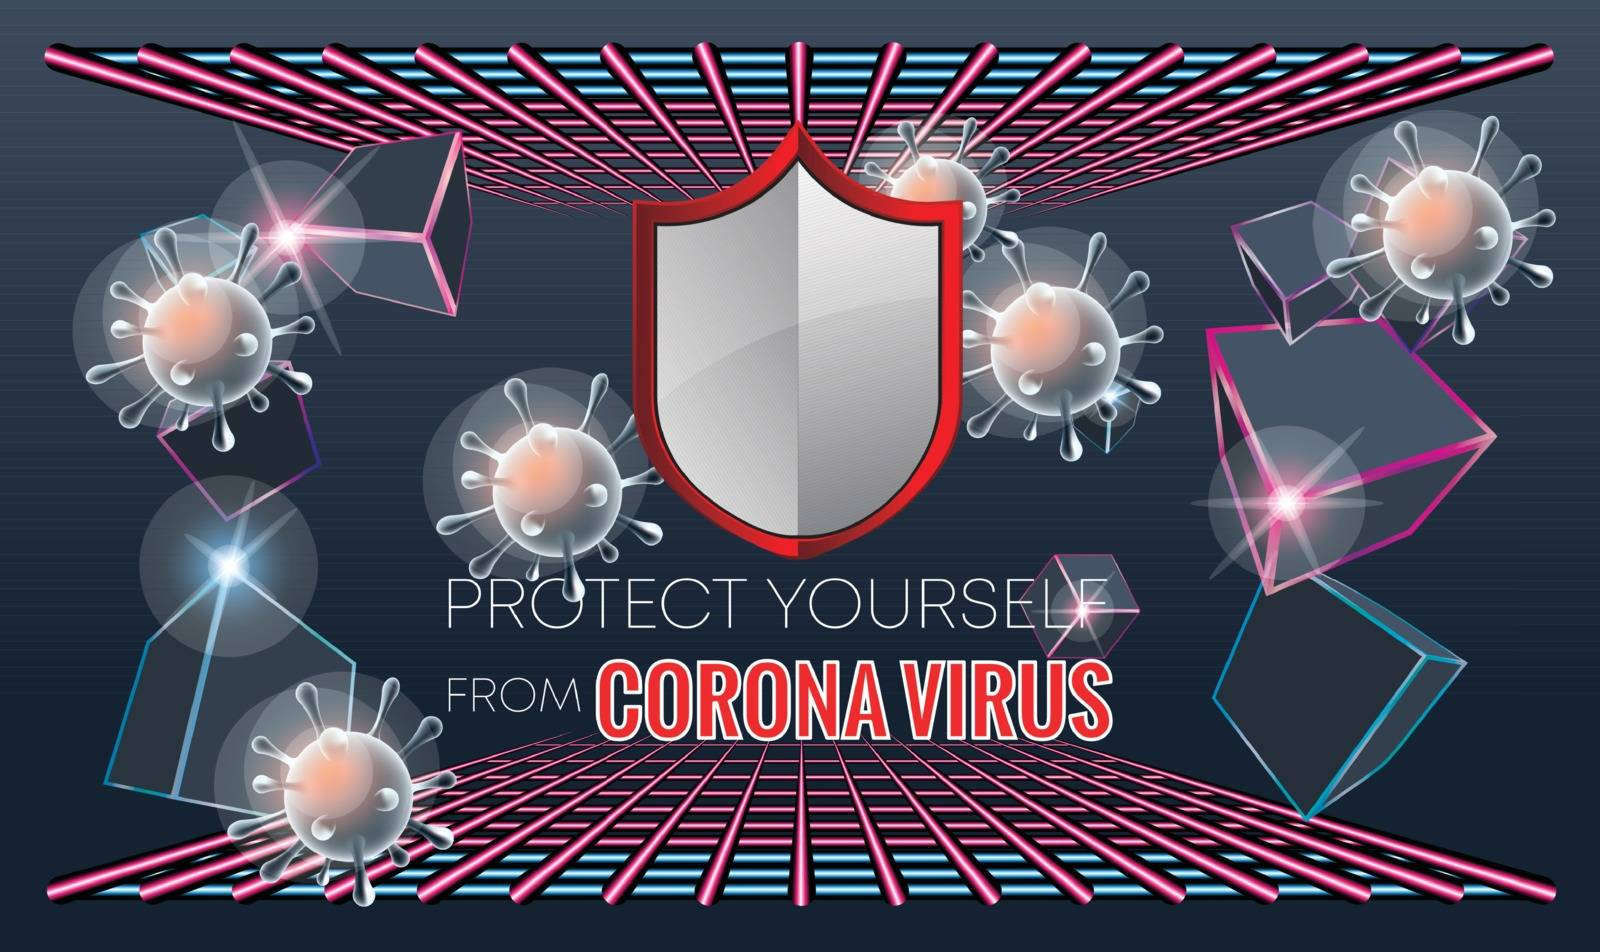 Protect yourself from corona virus